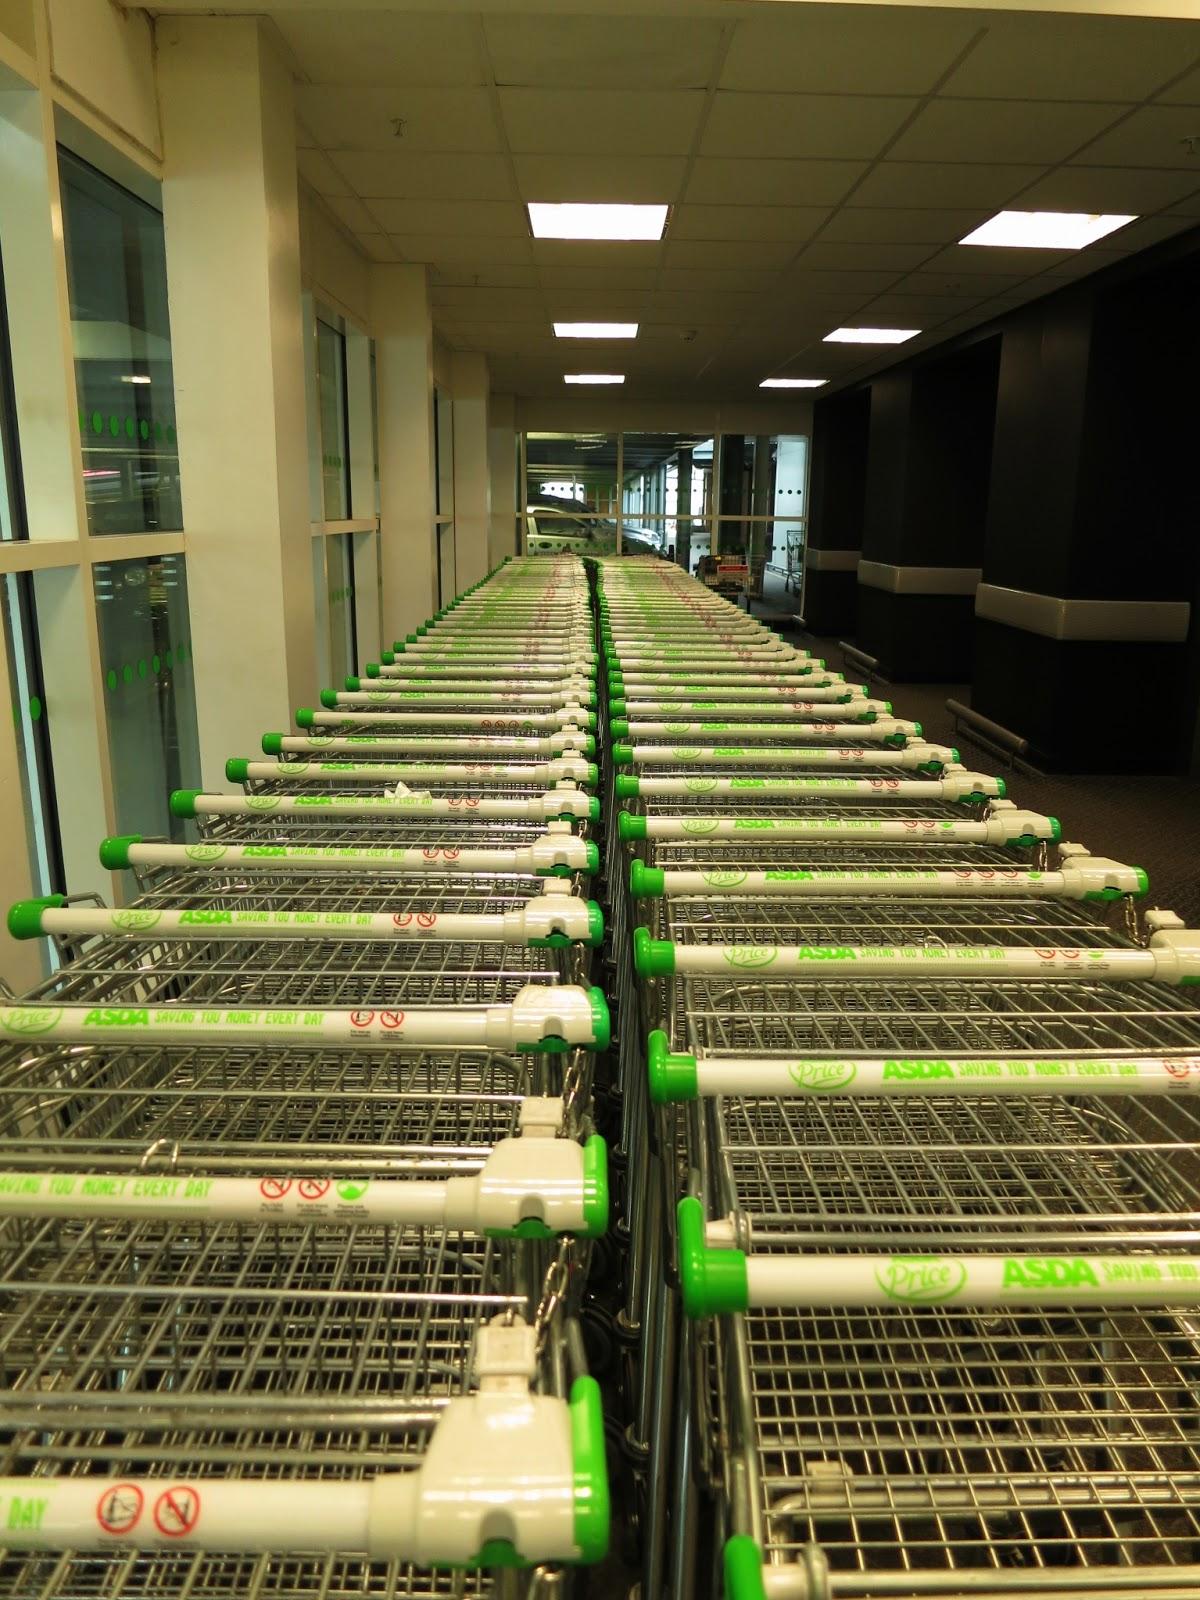 Two long lines of trolleys in supermarket foyer